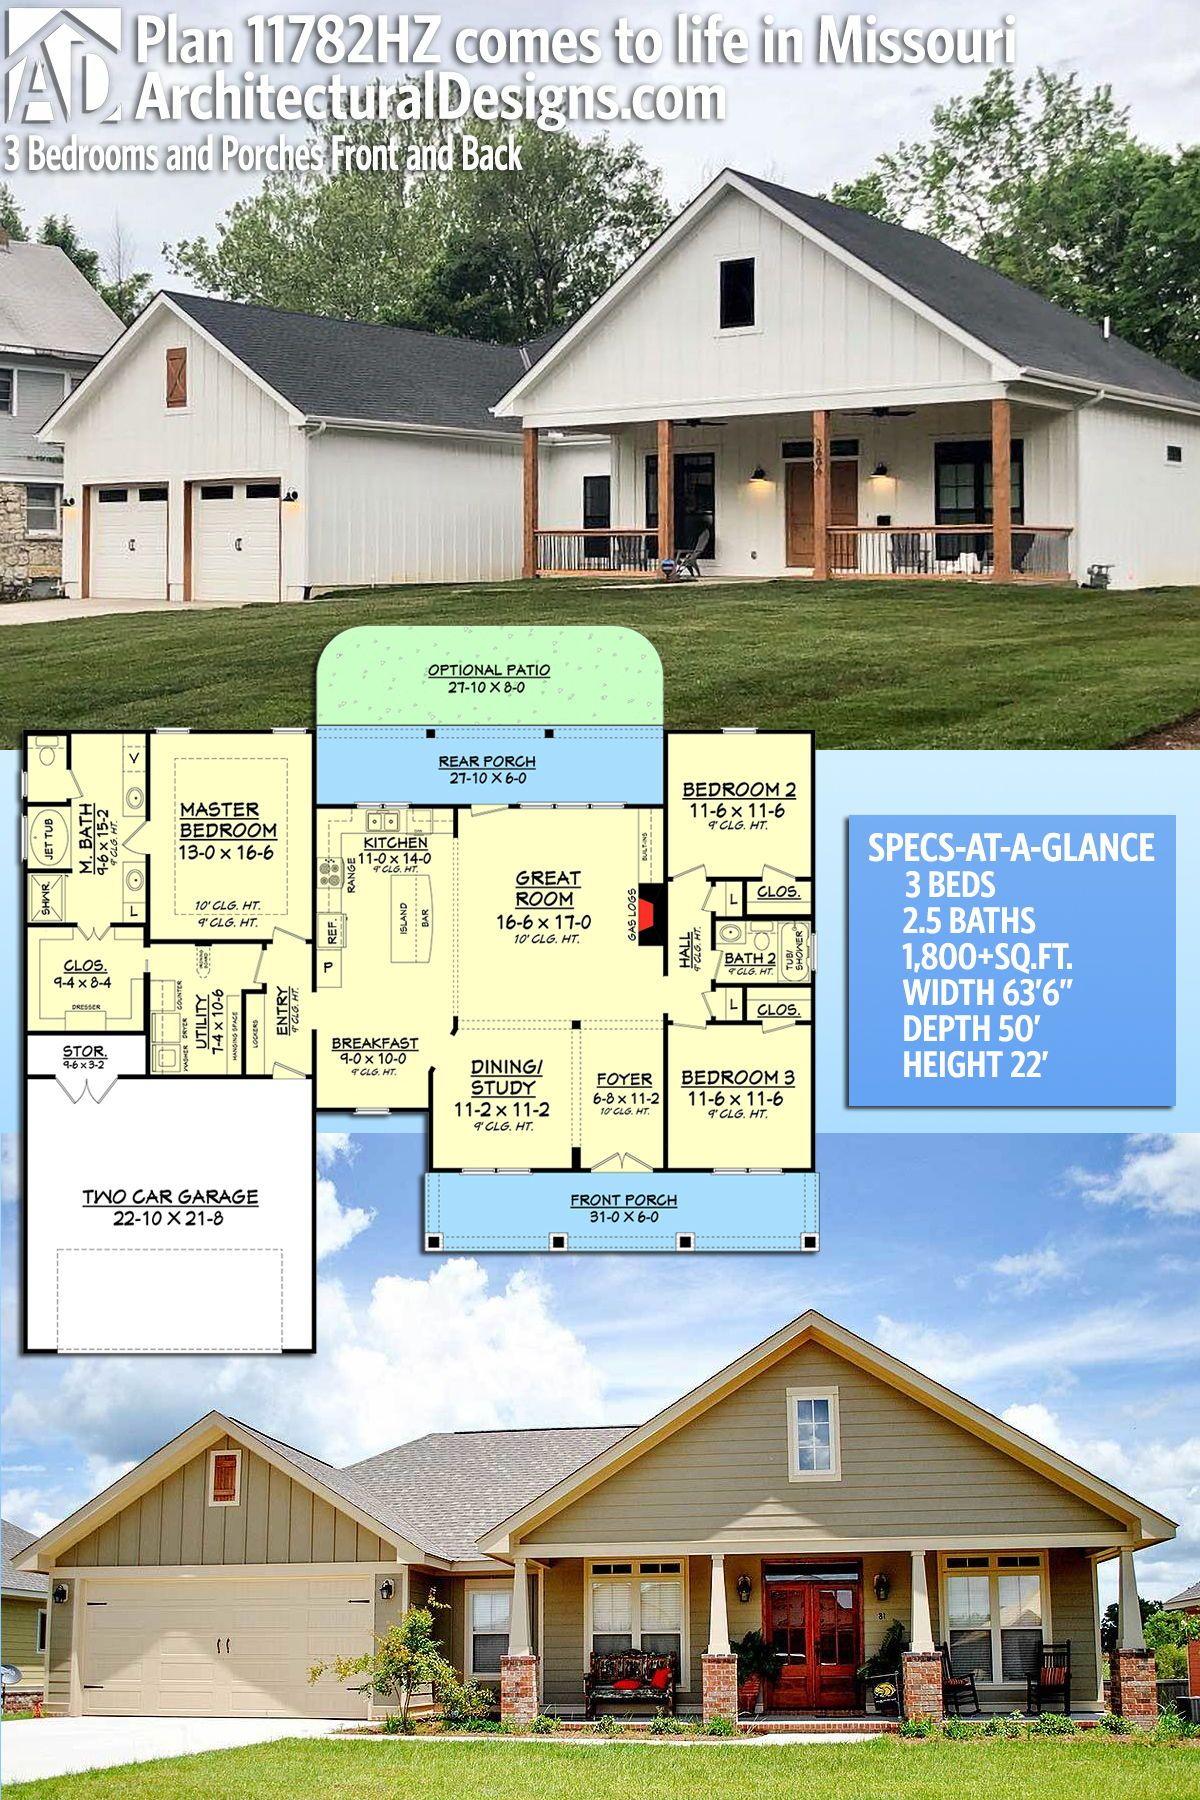 Plan 11782hz 3 Bedrooms And Porches Front And Back House Plans Farmhouse Architectural Design House Plans Farmhouse House